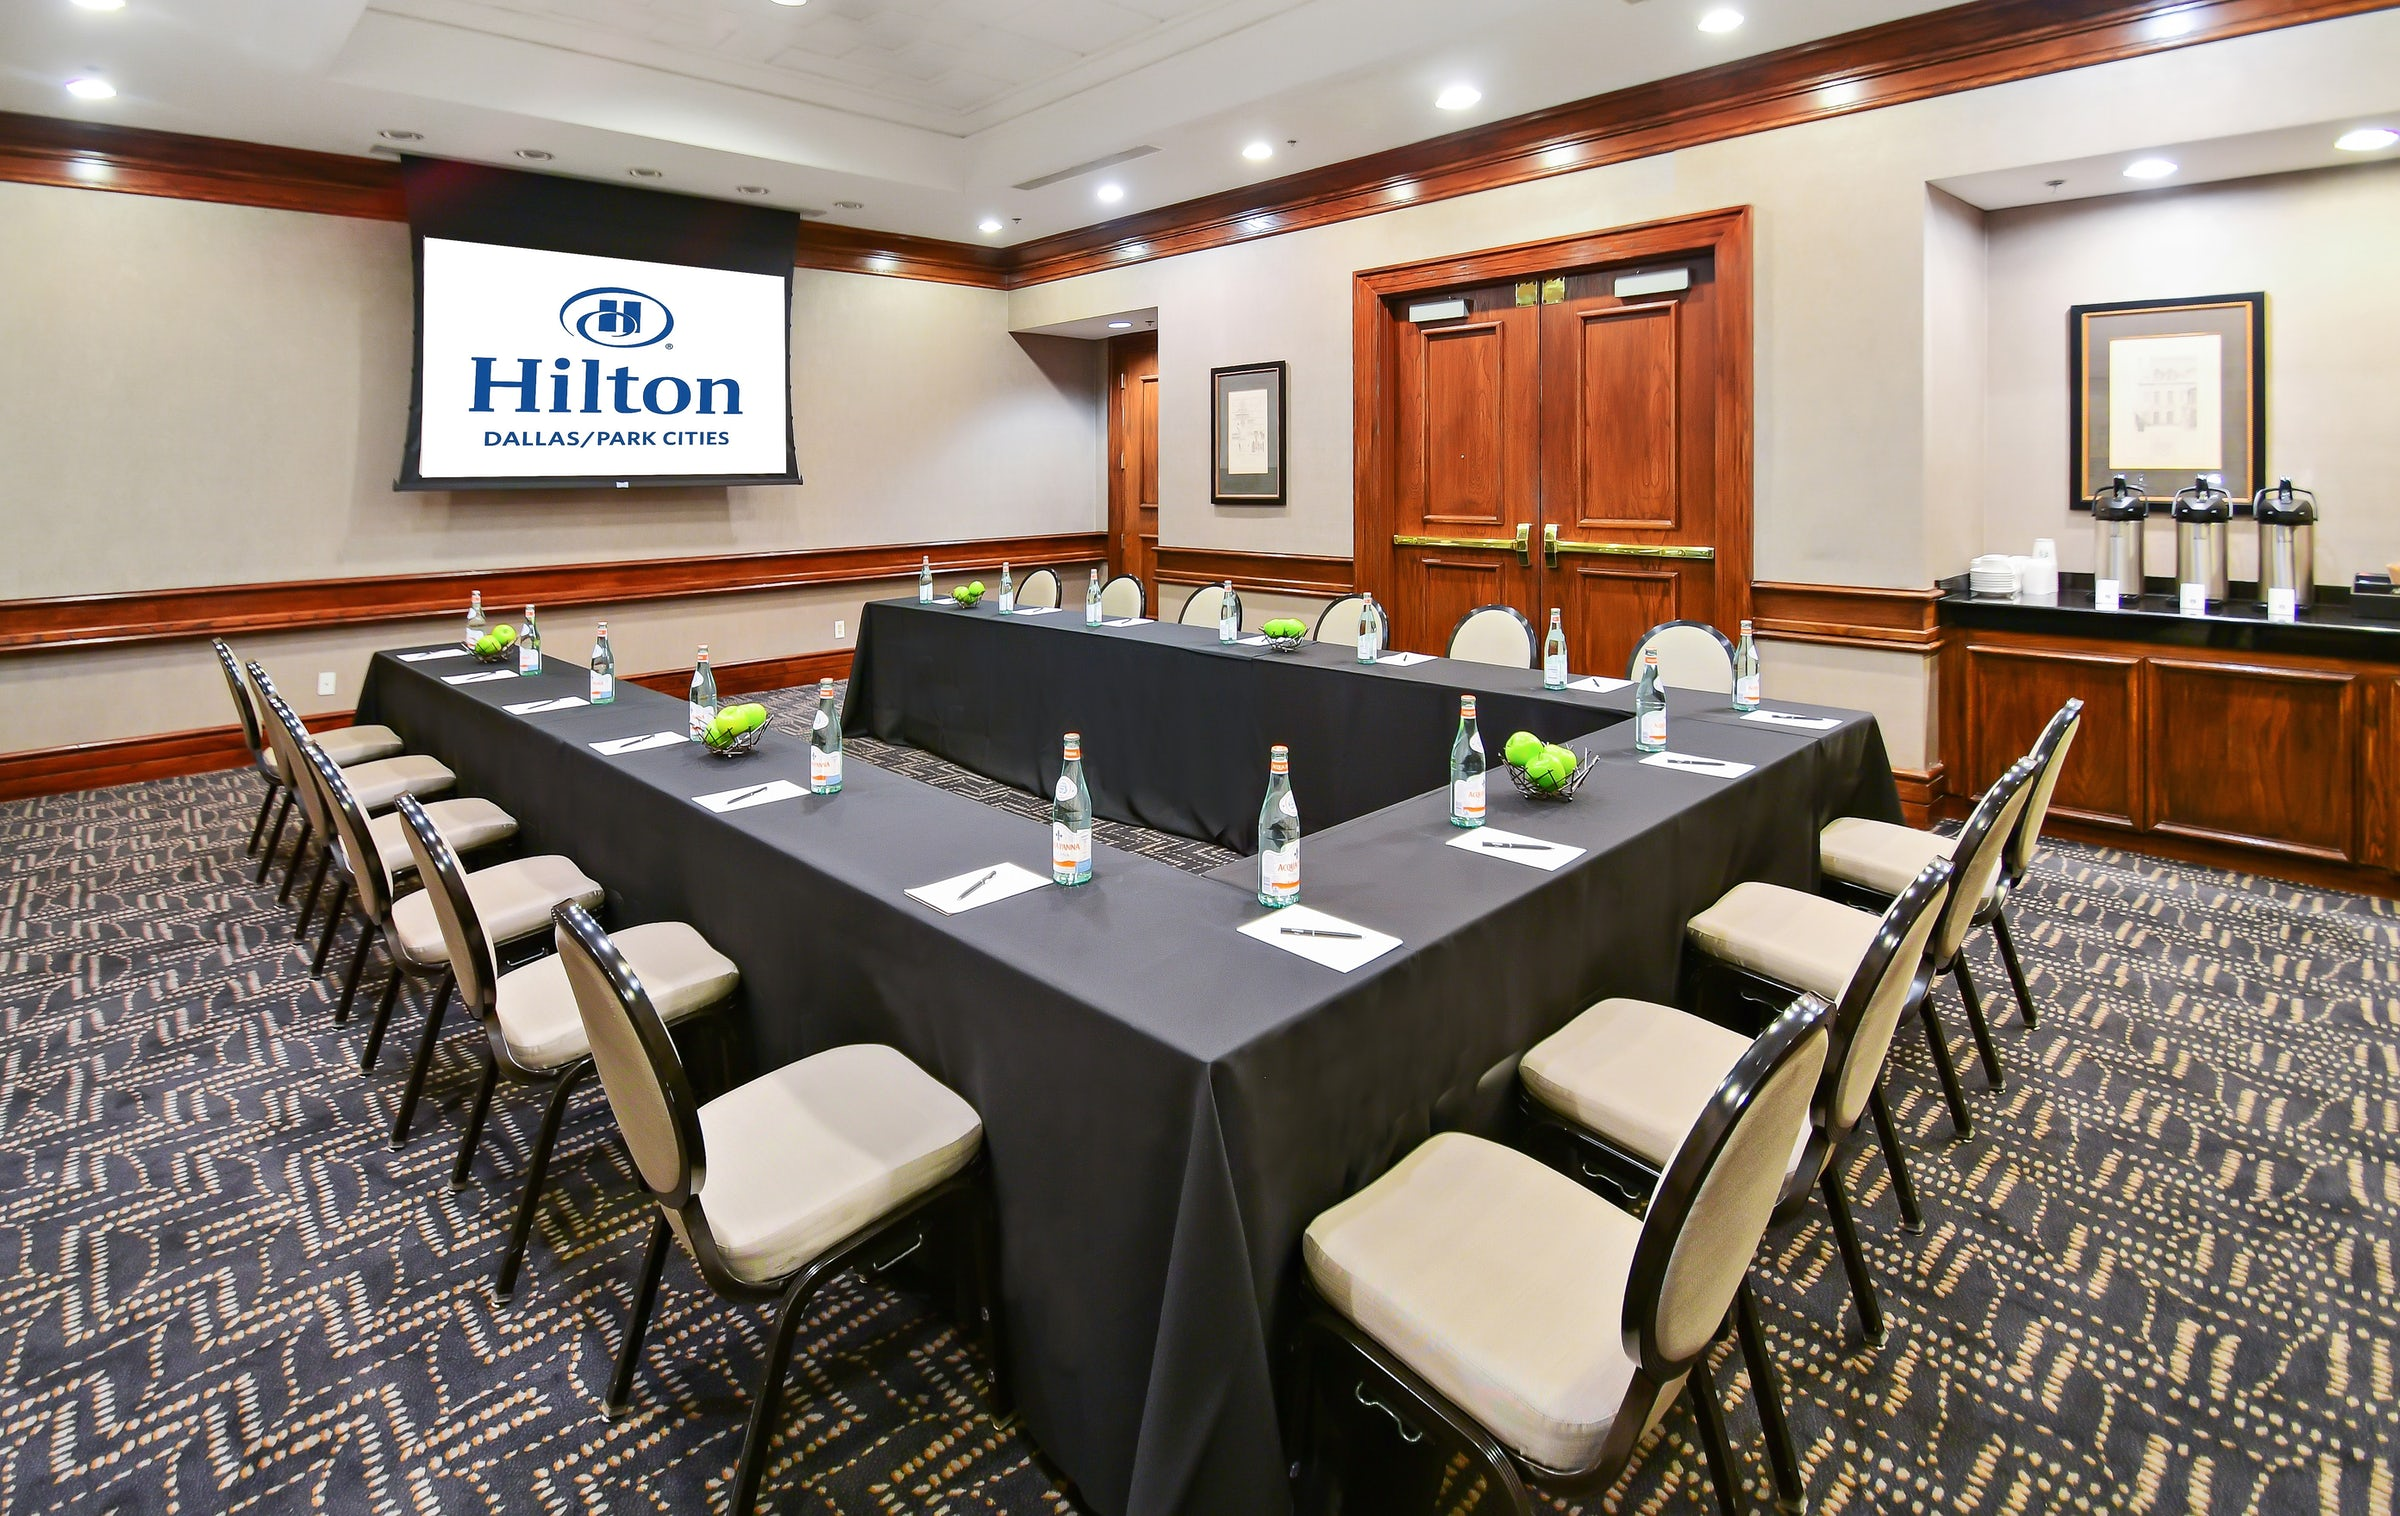 Hilton Dallas/Park Cities in Beyond Dallas